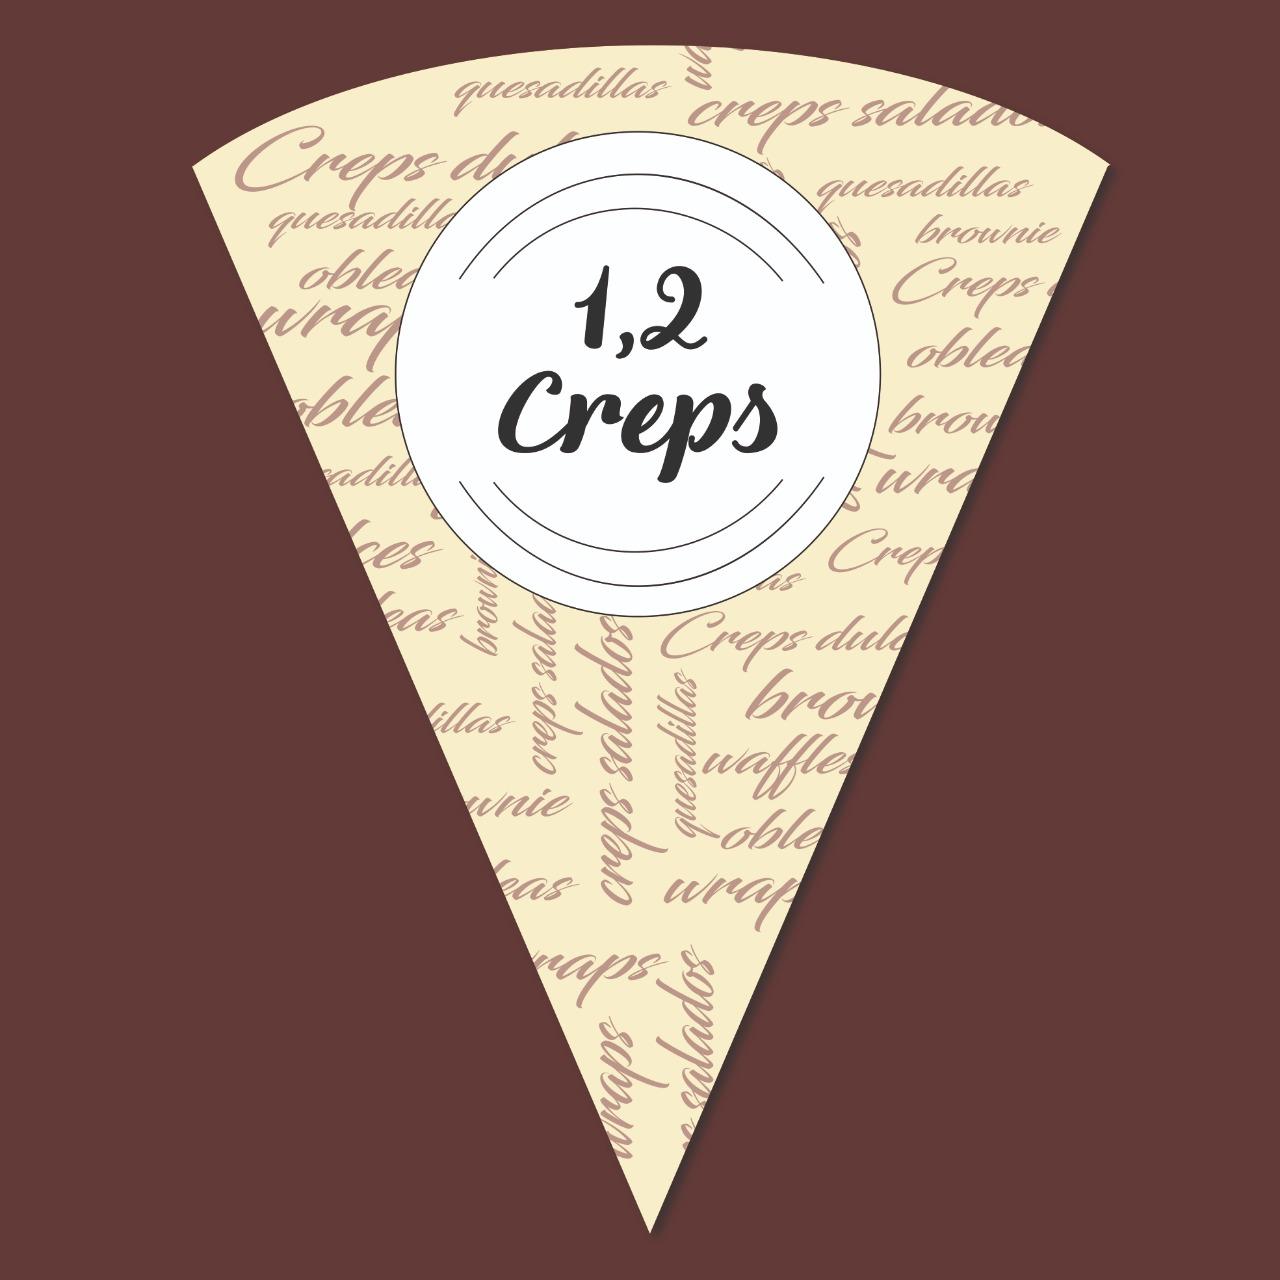 1, 2 Creps